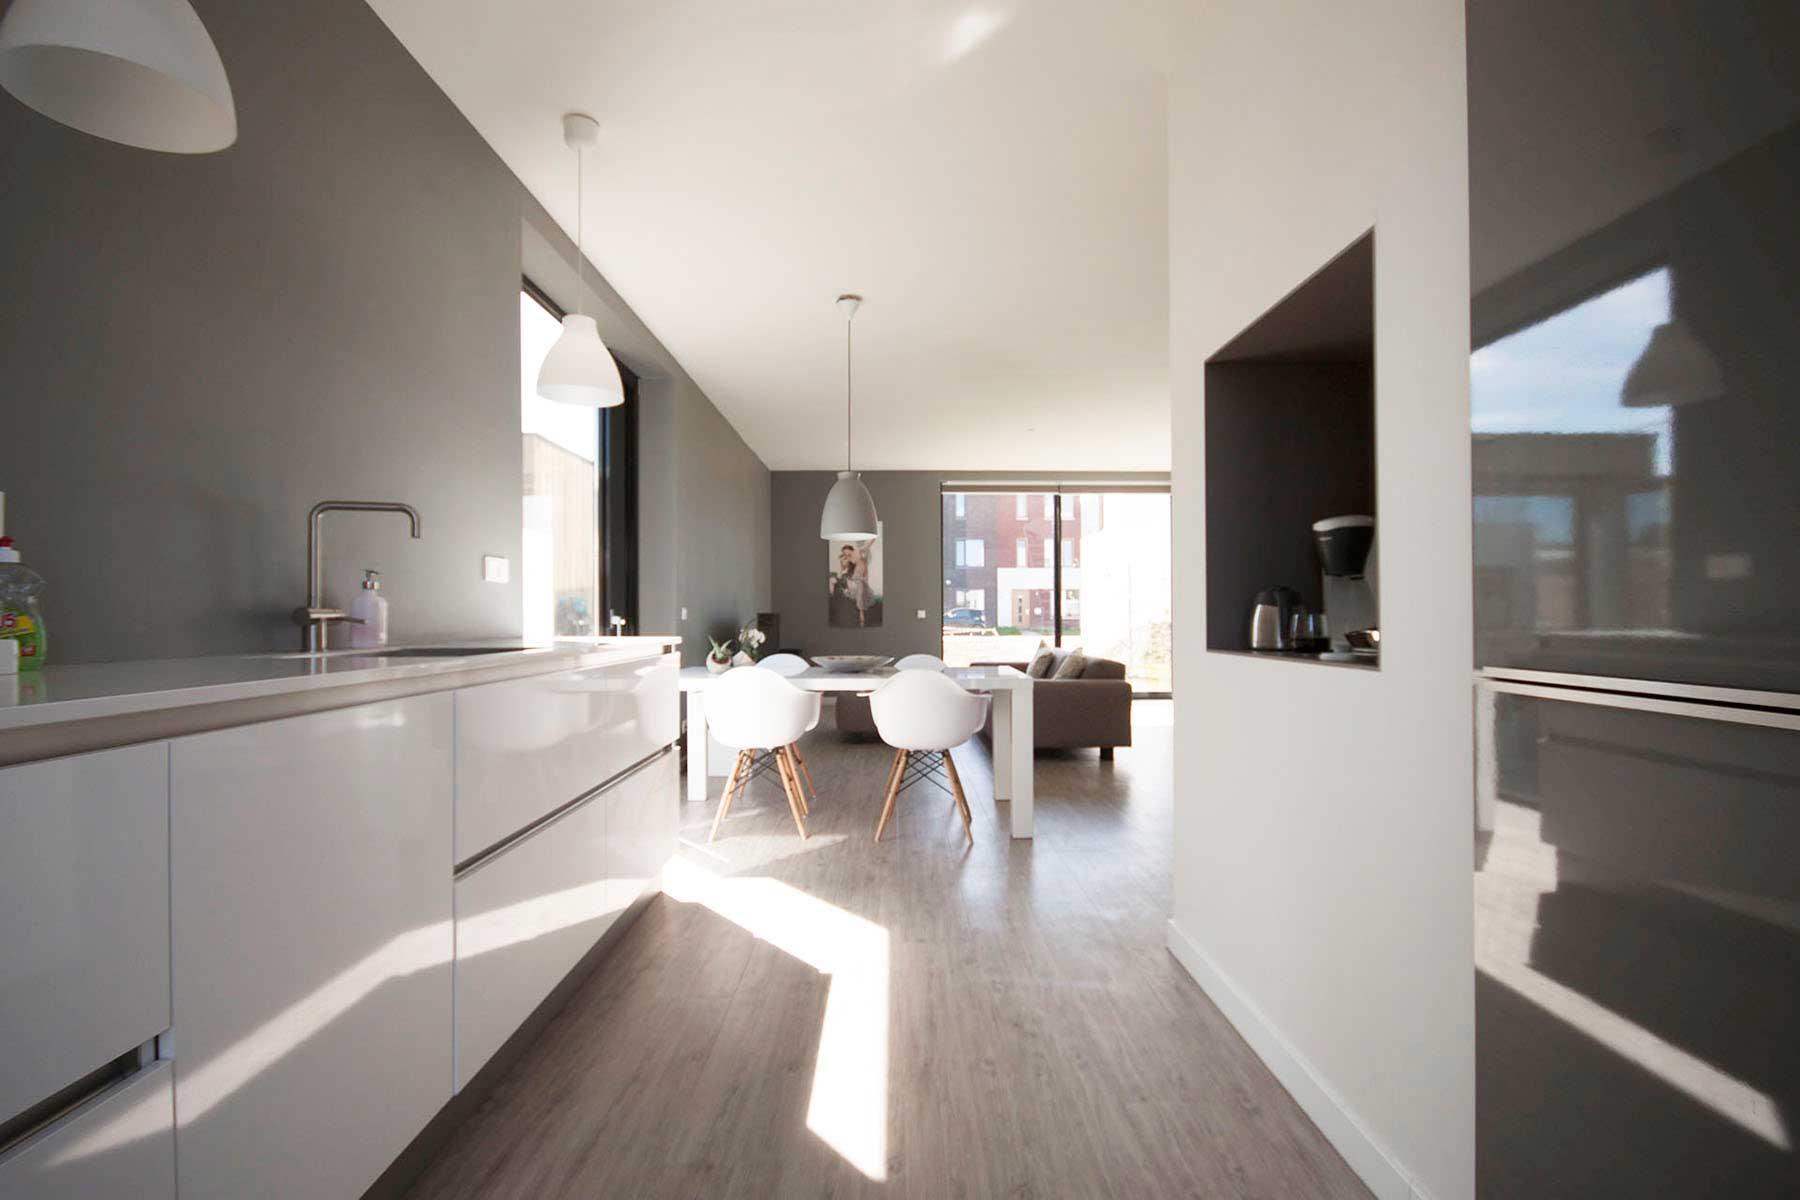 8A-Architecten-datcha-house-2-Lent-07